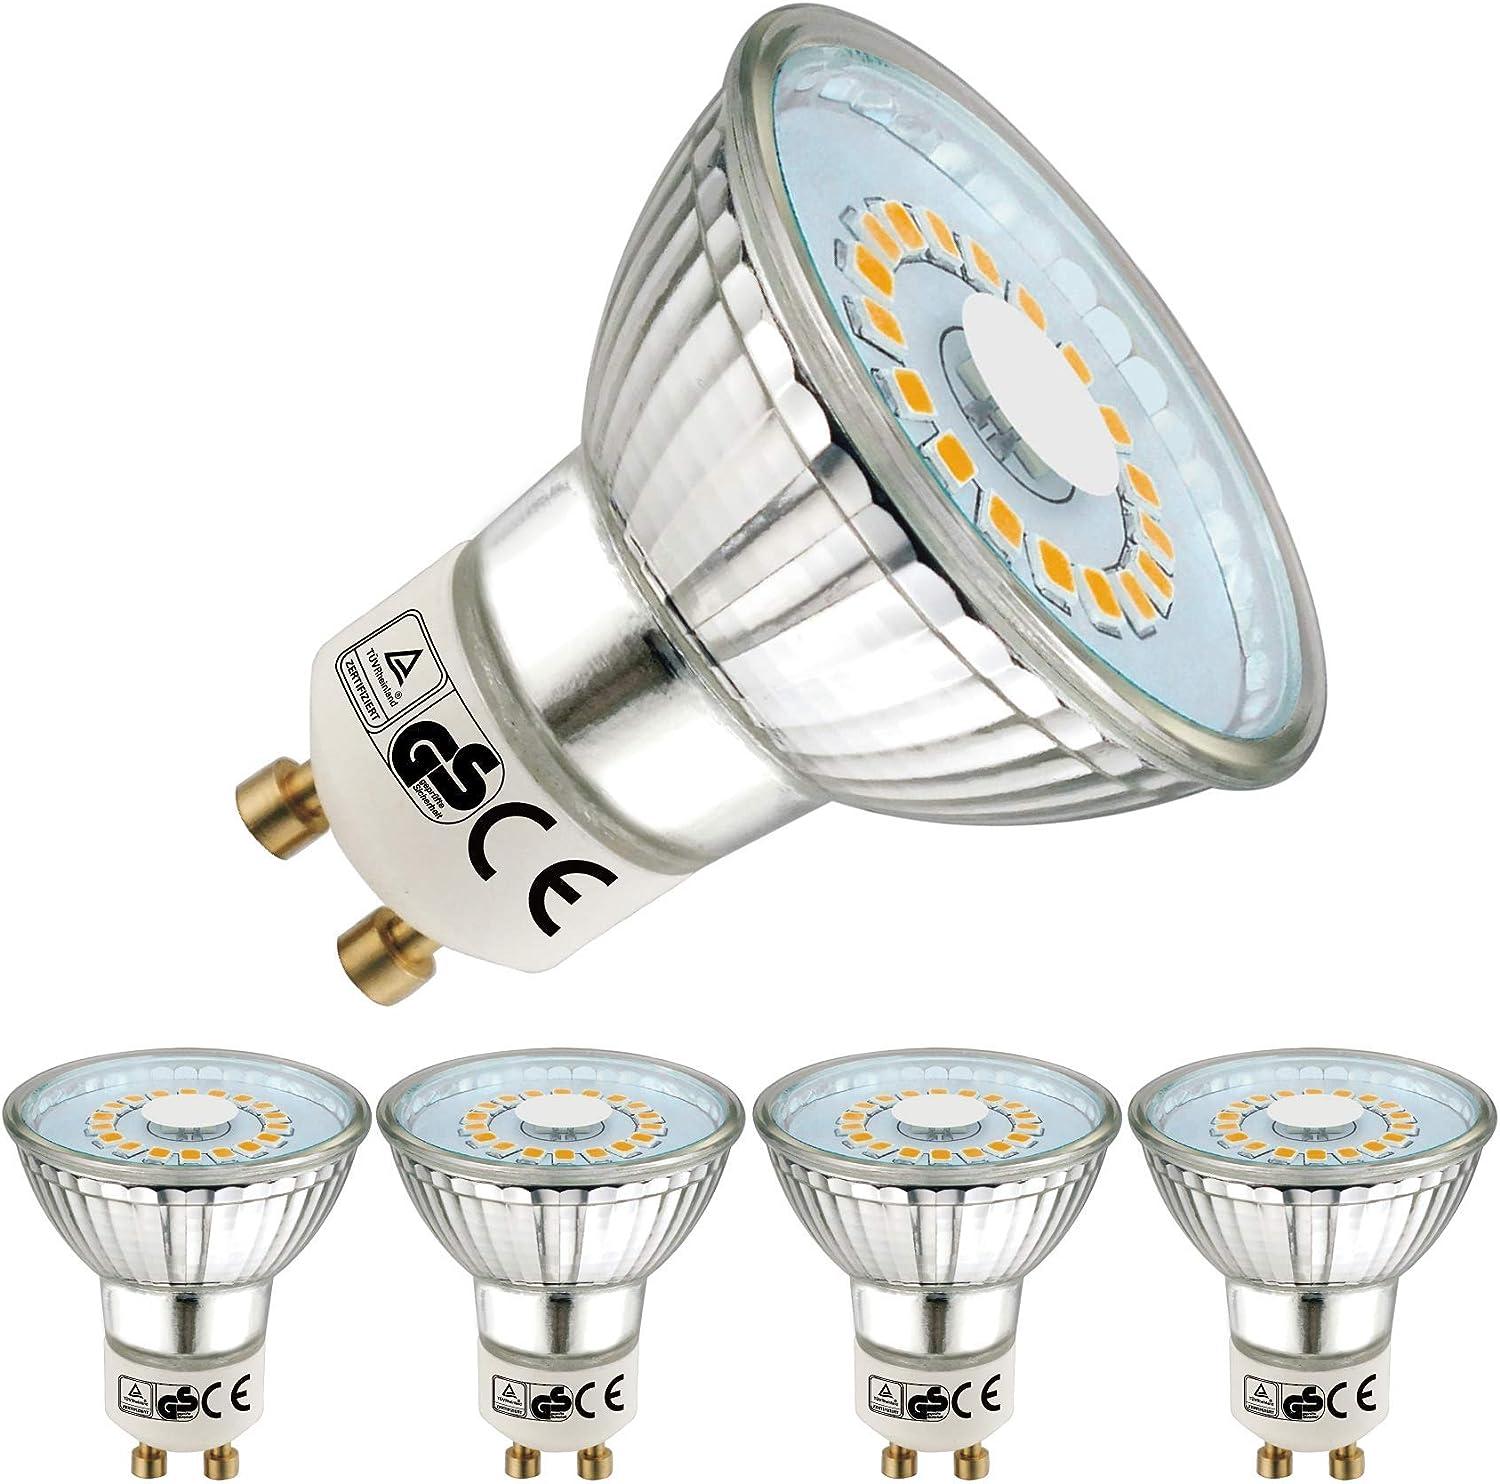 EACLL Bombillas LED GU10 2700K Blanco Cálido 5W 535 Lúmenes Equivalente 50W Halógena. Sin Estroboscópica, 120 ° Luz Blanca Cálida Spotlight LED, 4 Pack